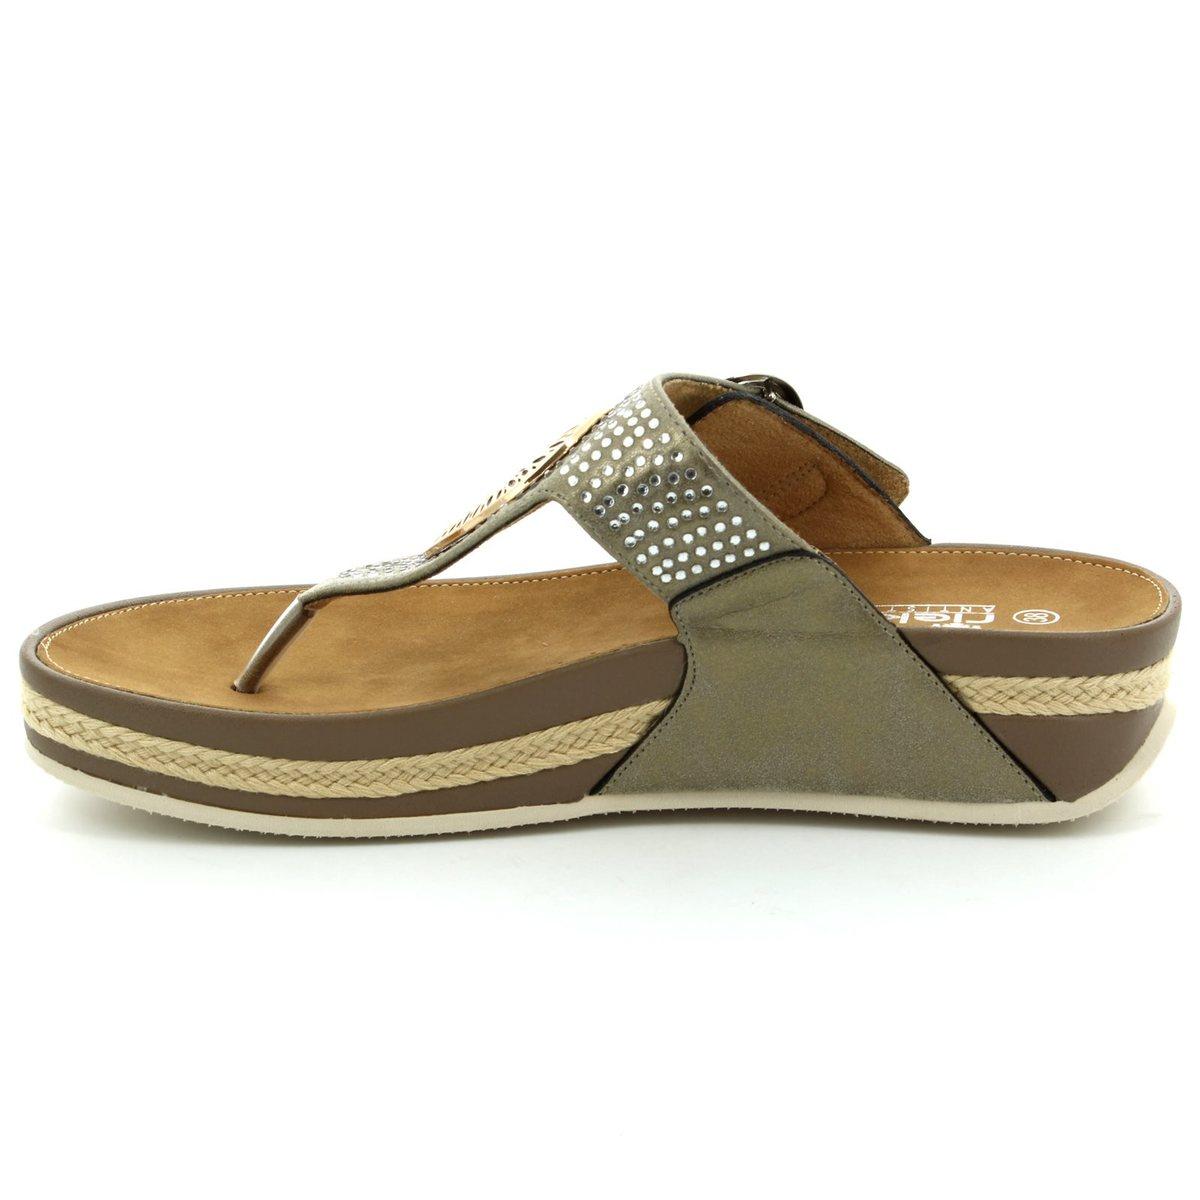 0207cccf7c872 Rieker Sandals - Metallic - V1460-62 LULU